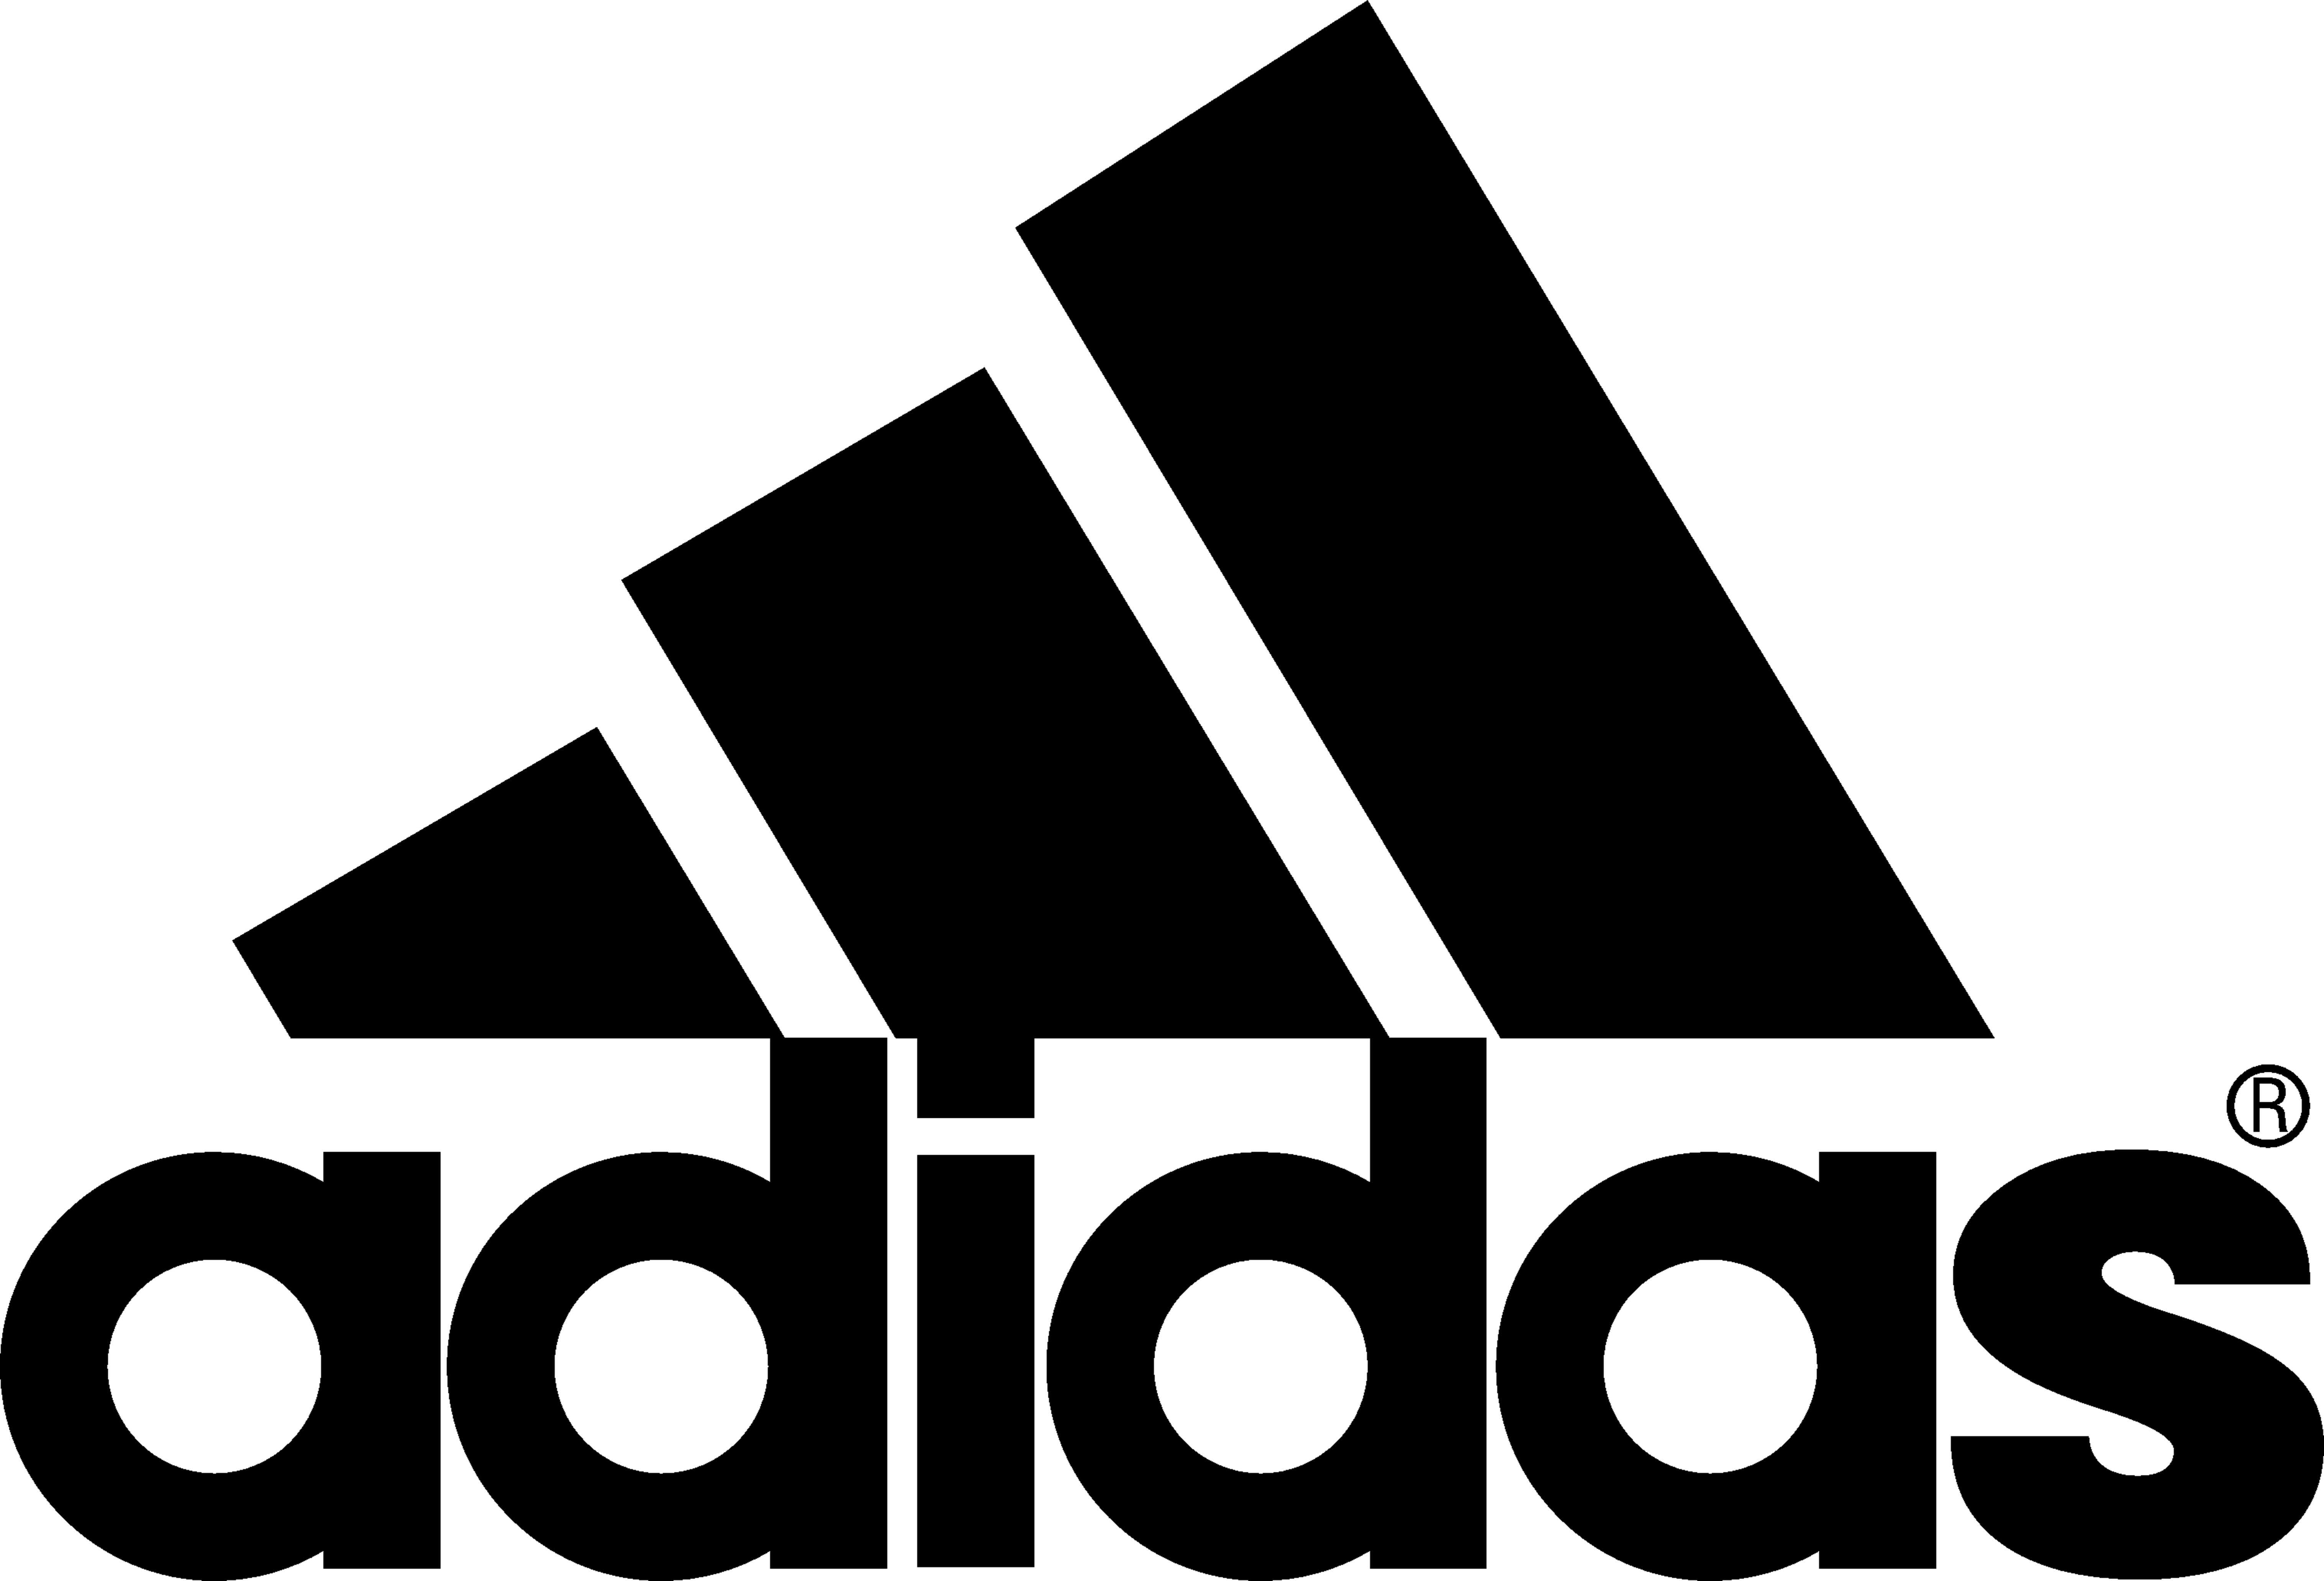 Adidas Shoes Hd Clipart. Wifi-Adidas shoes hd clipart. Wifi-13